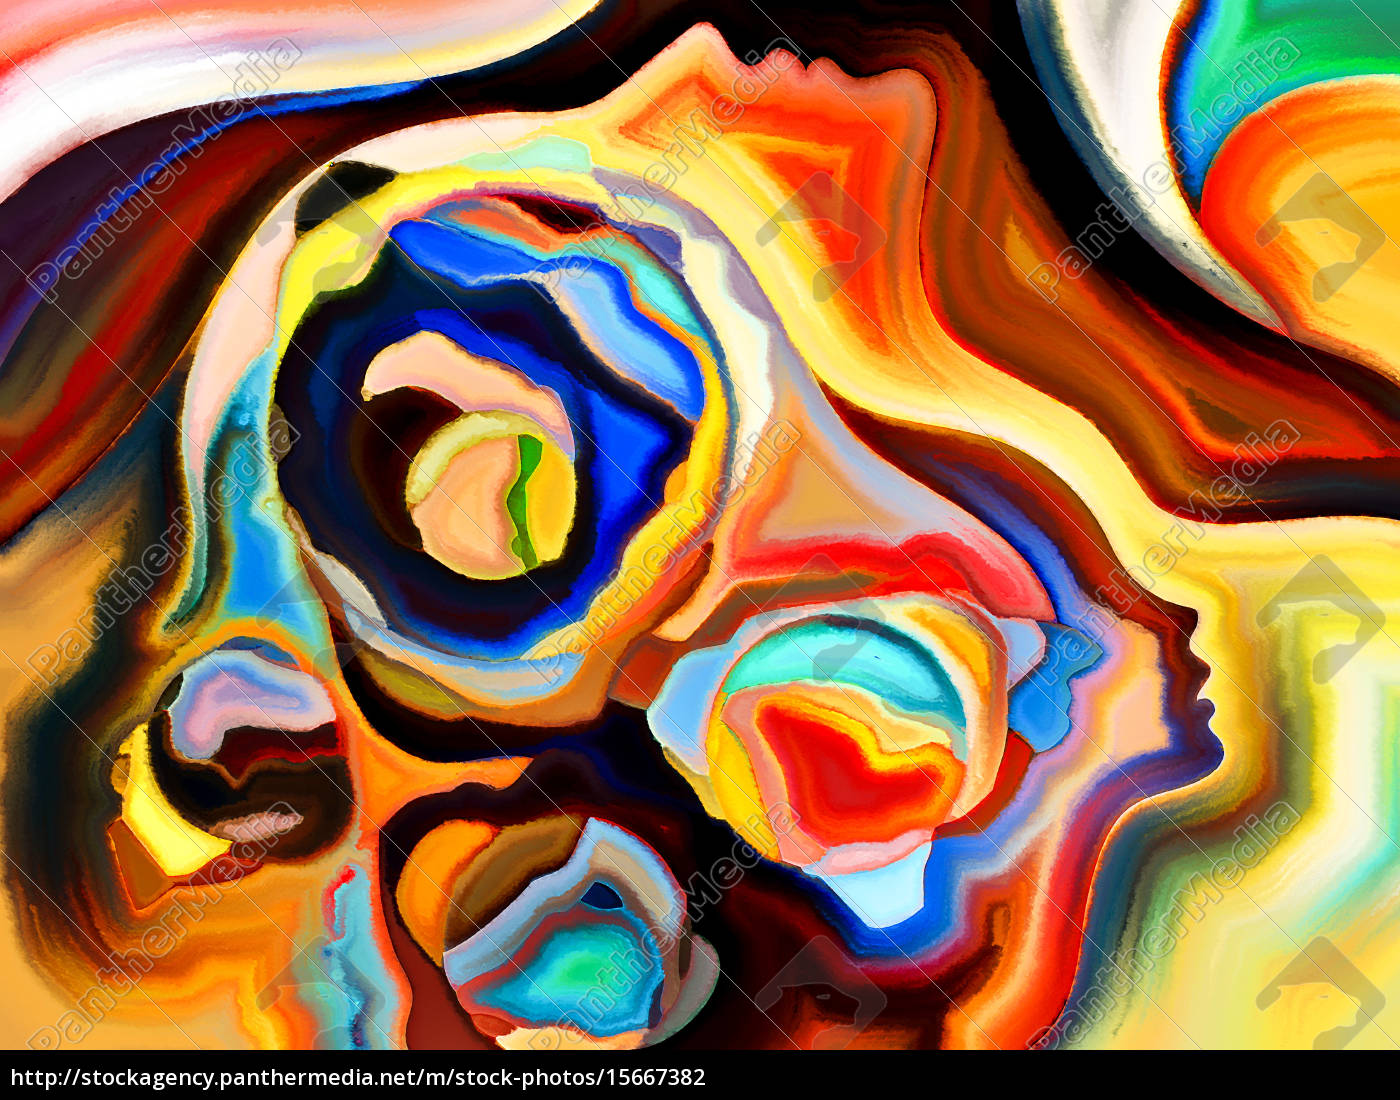 unfolding, of, mind, shapes - 15667382